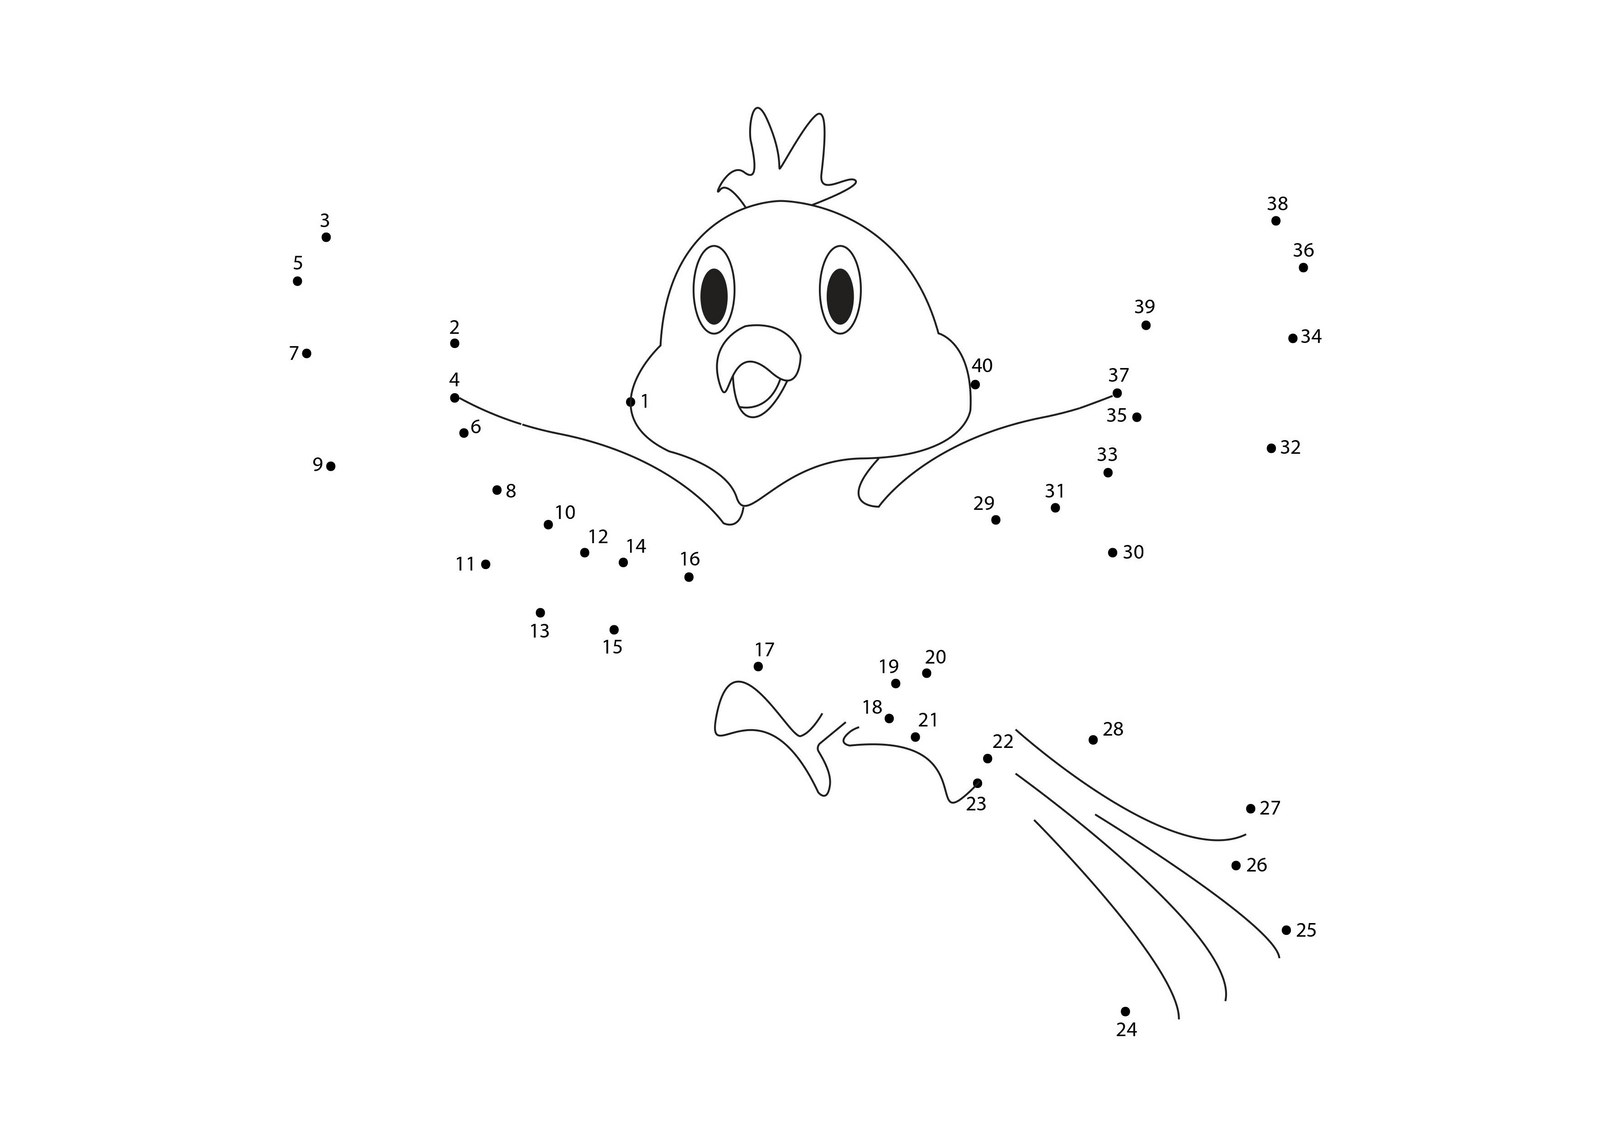 skip counting dot to dot worksheets (4) - Free Math Worksheets